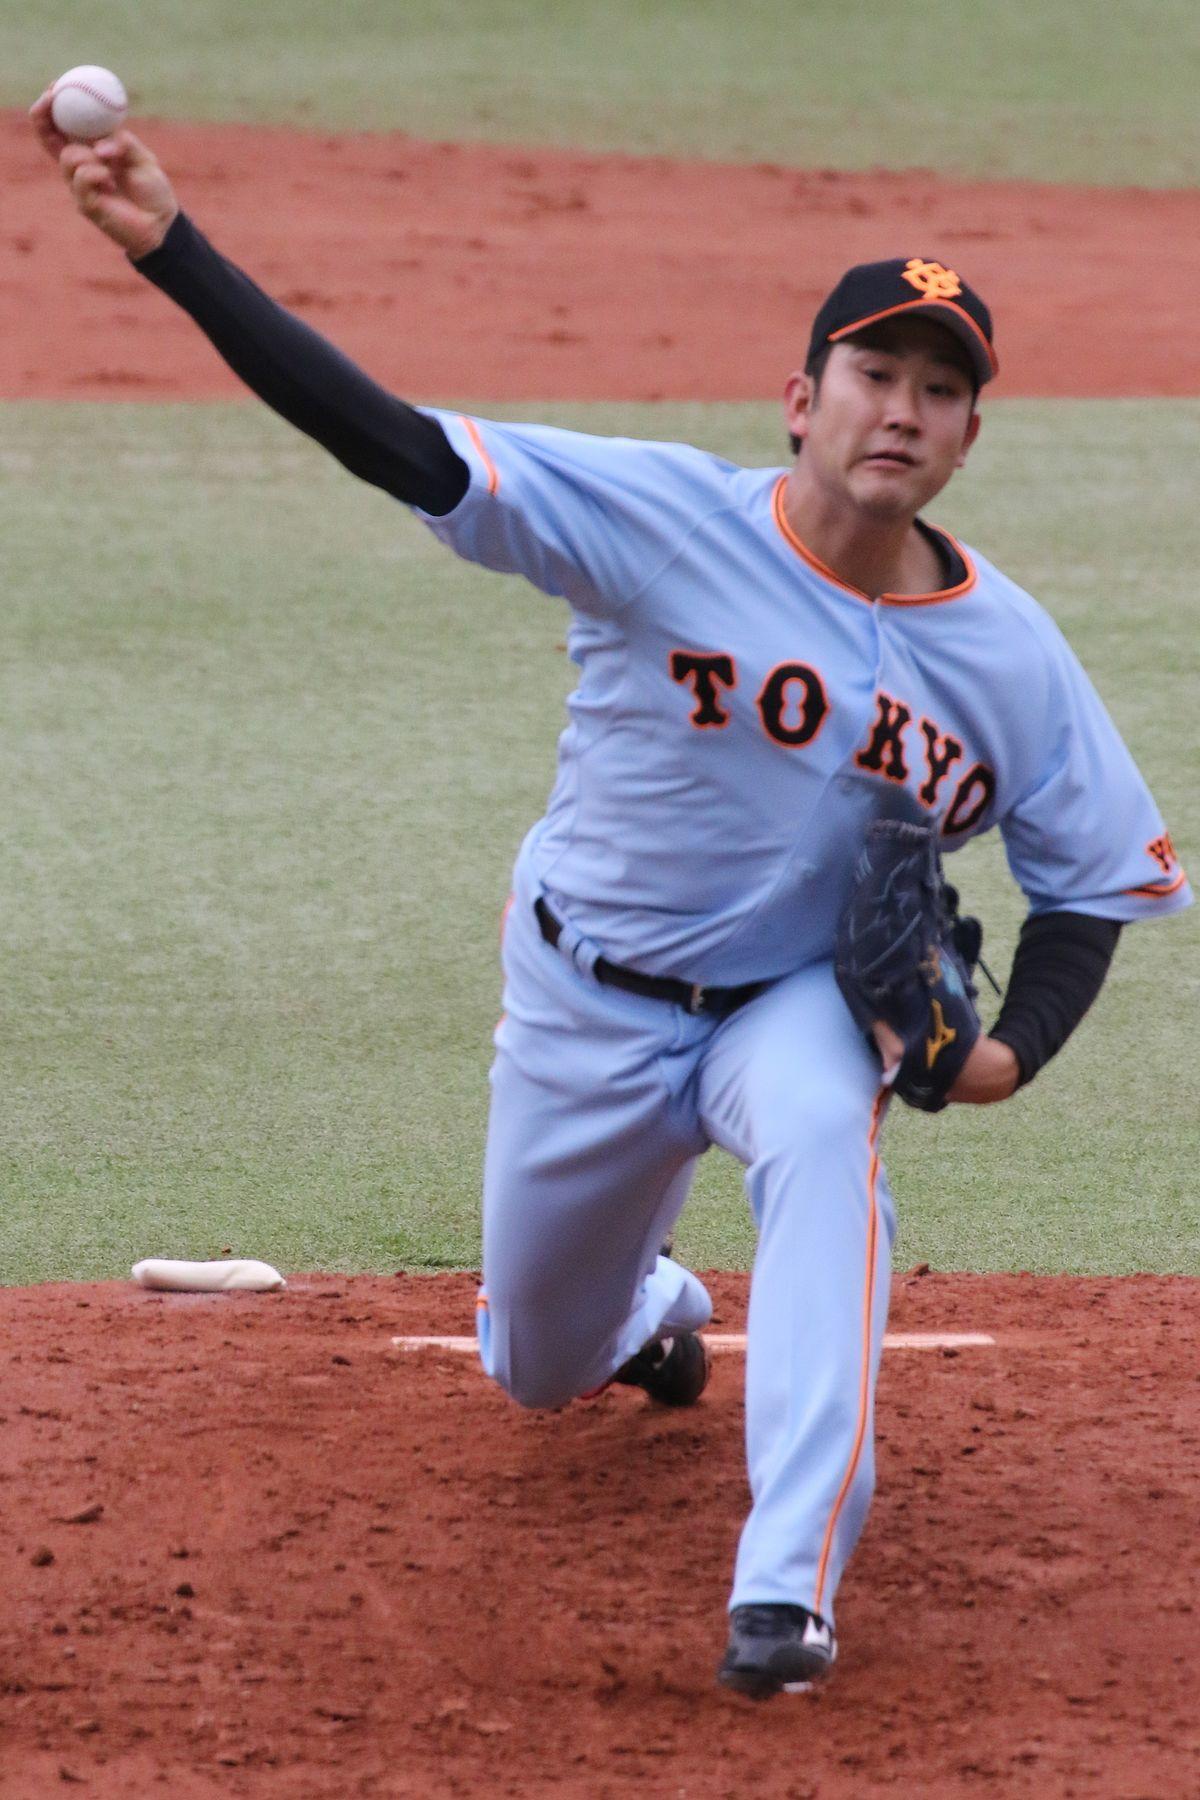 菅野智之 - Wikipedia